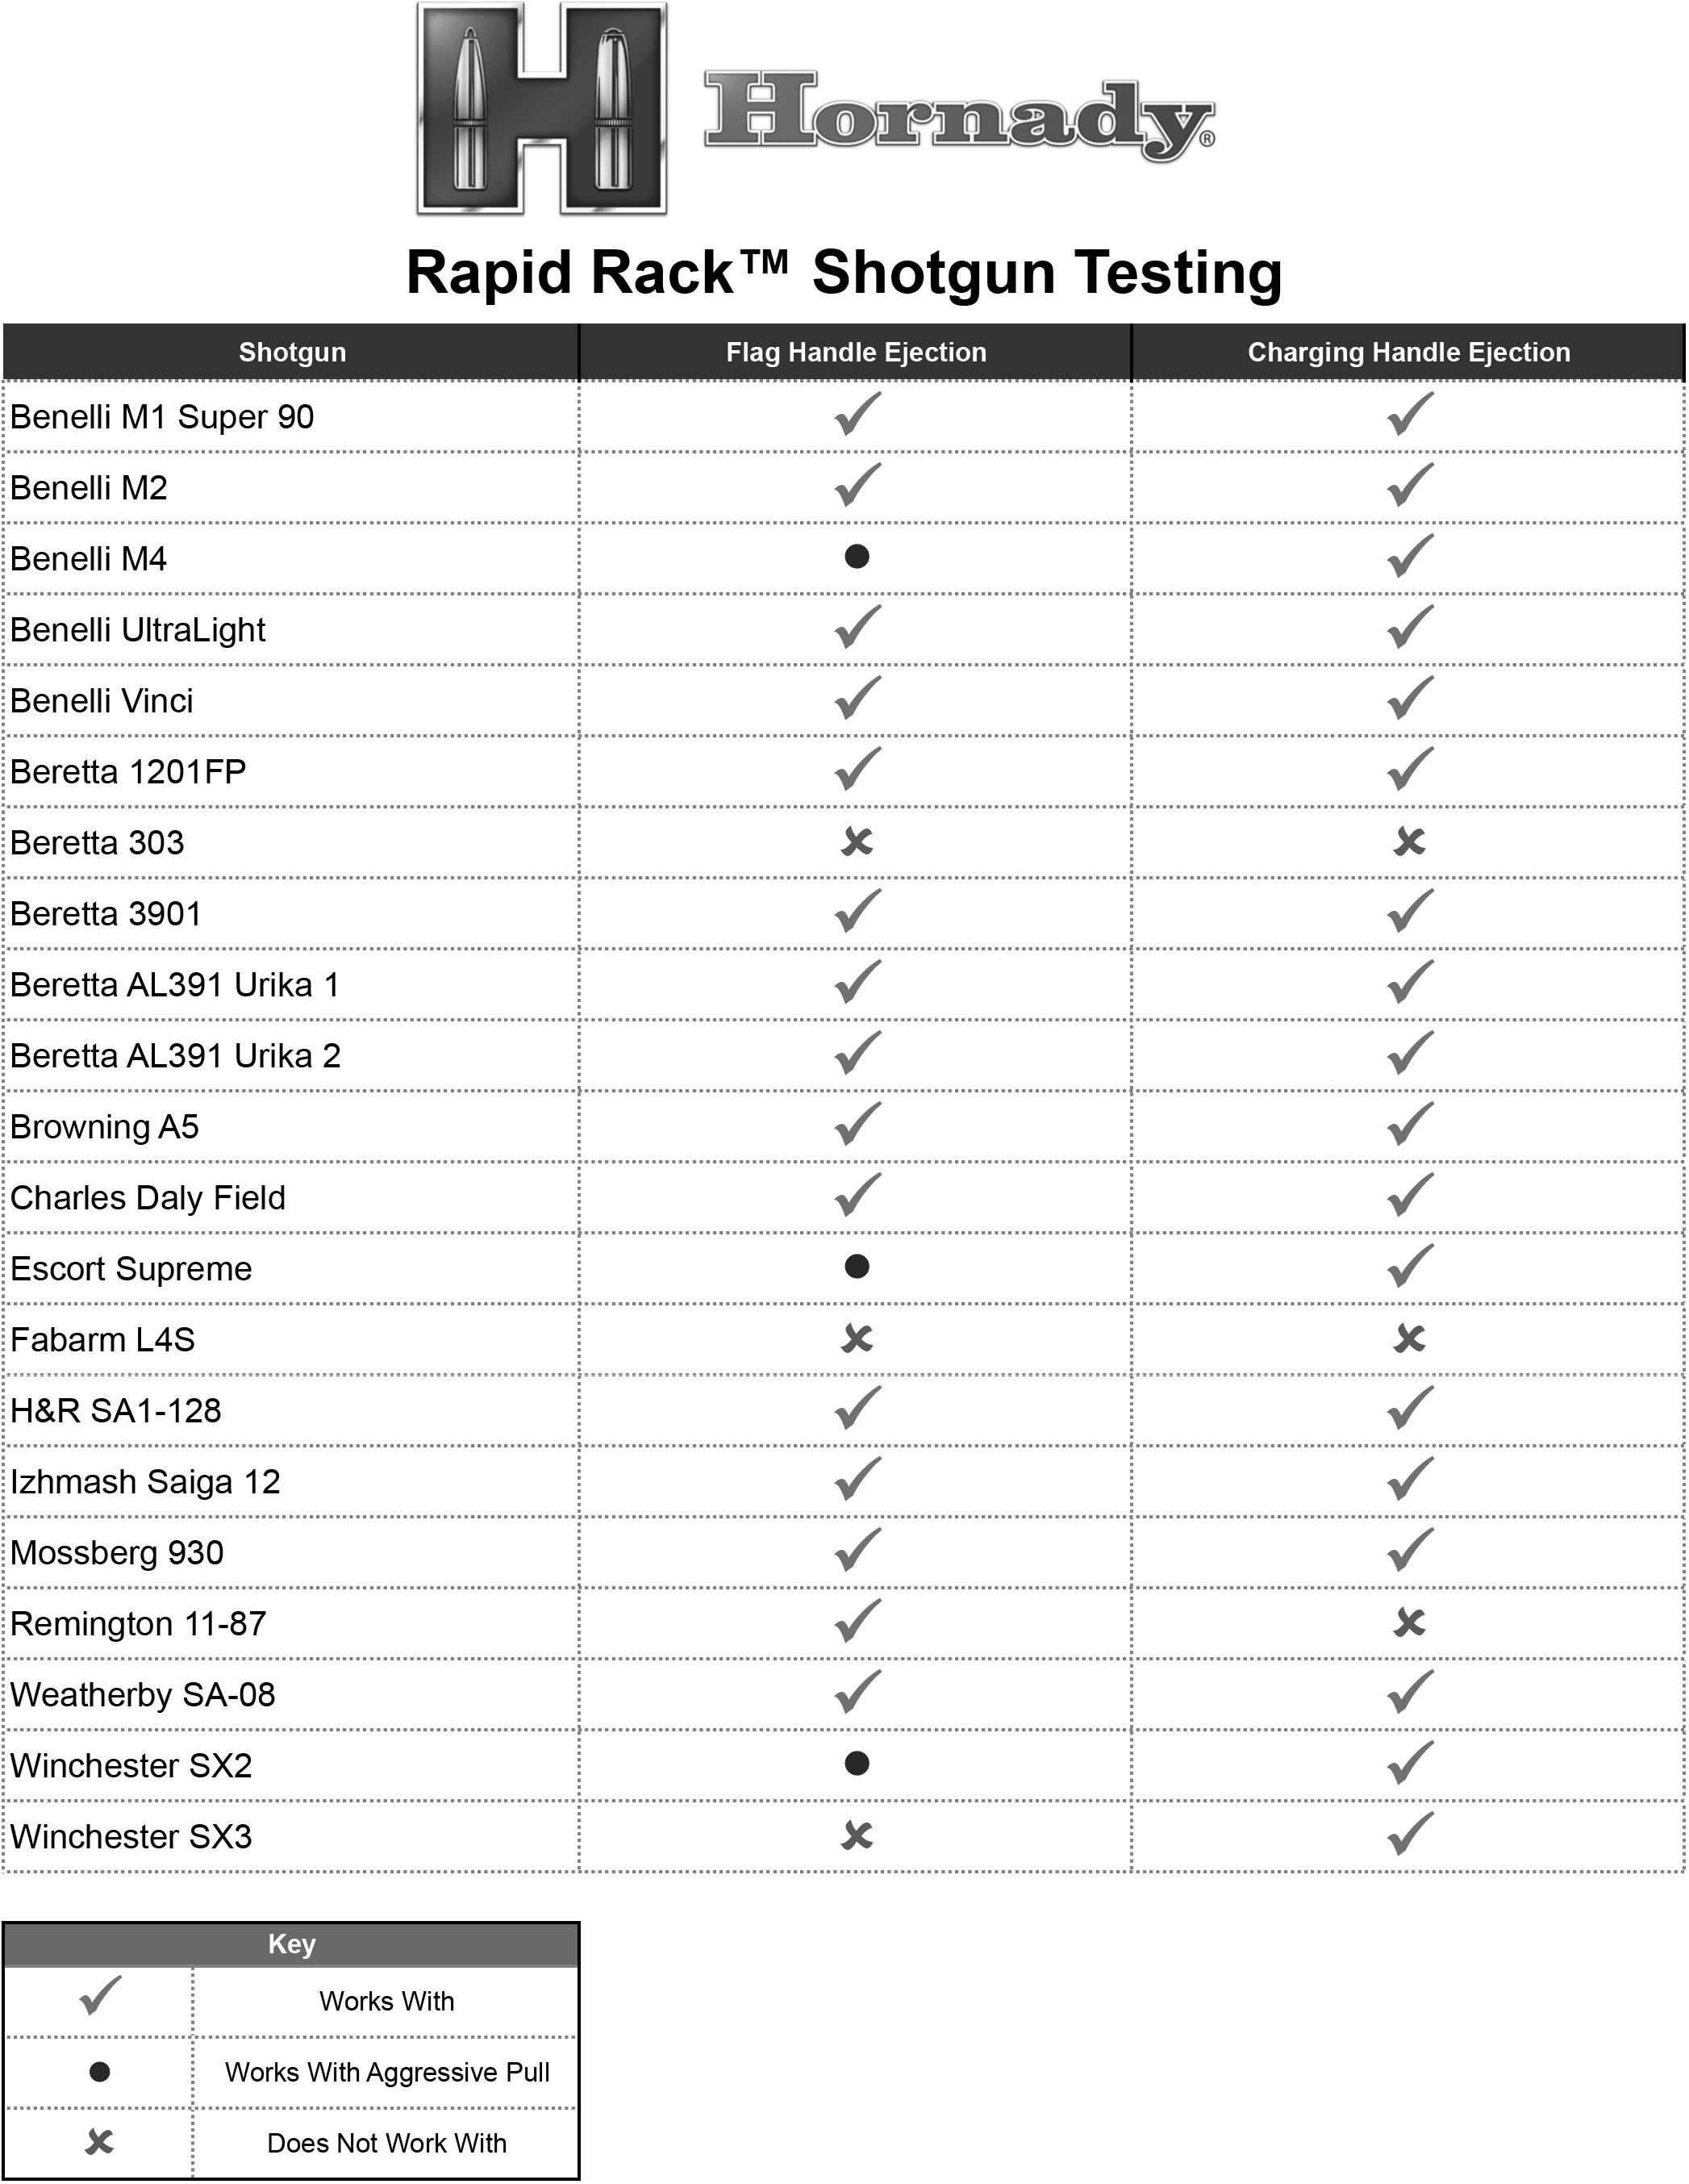 rapid-rack-shotgun-testing.jpg